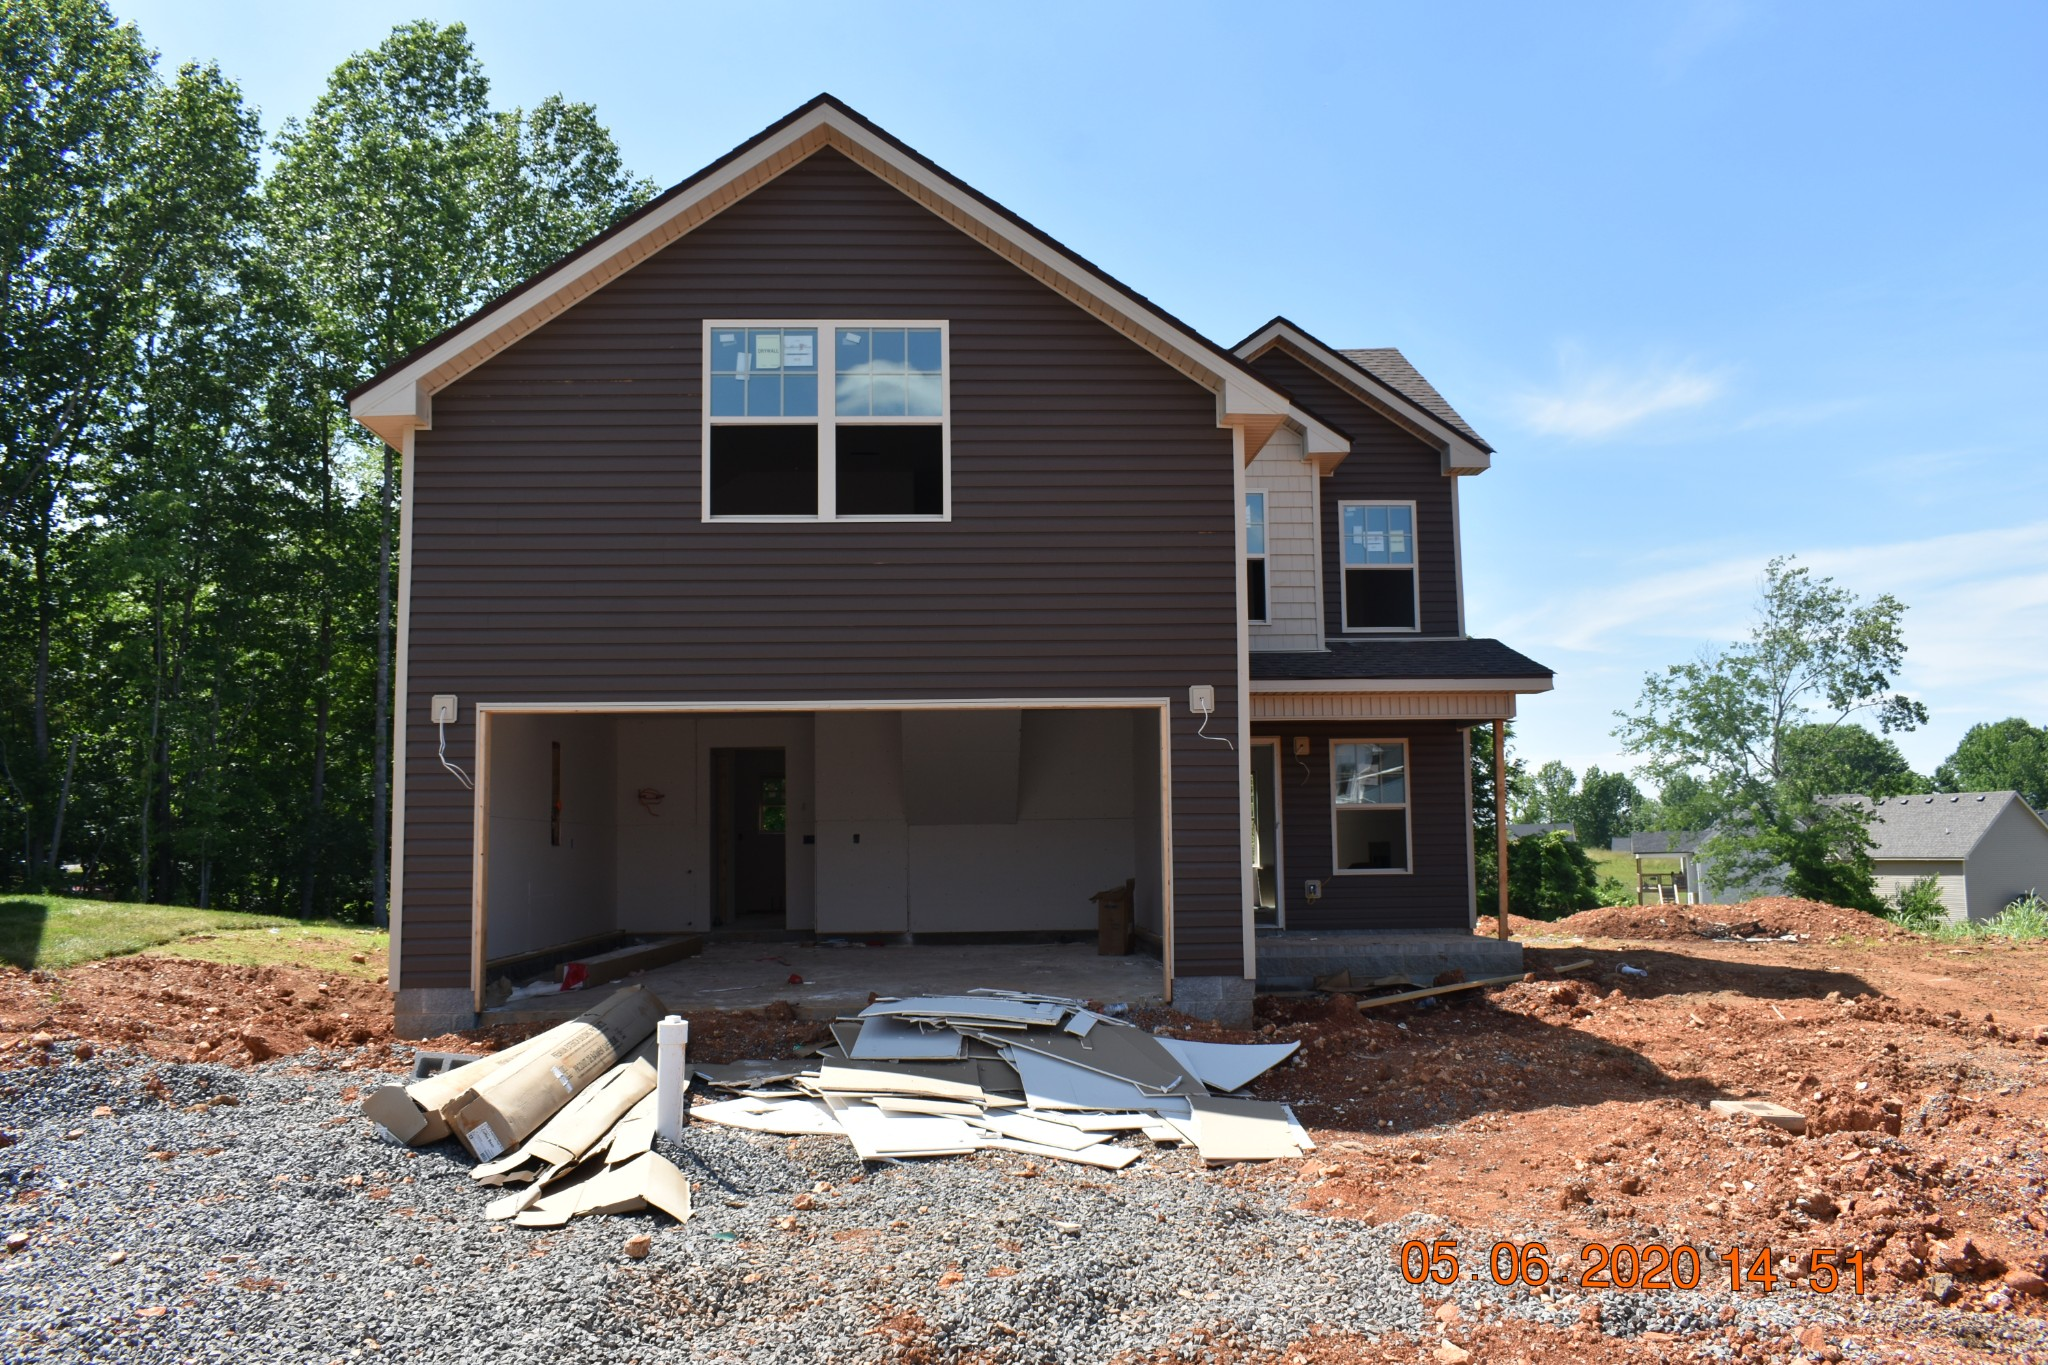 104 Chestnut Hill, Clarksville, TN 37042 - Clarksville, TN real estate listing